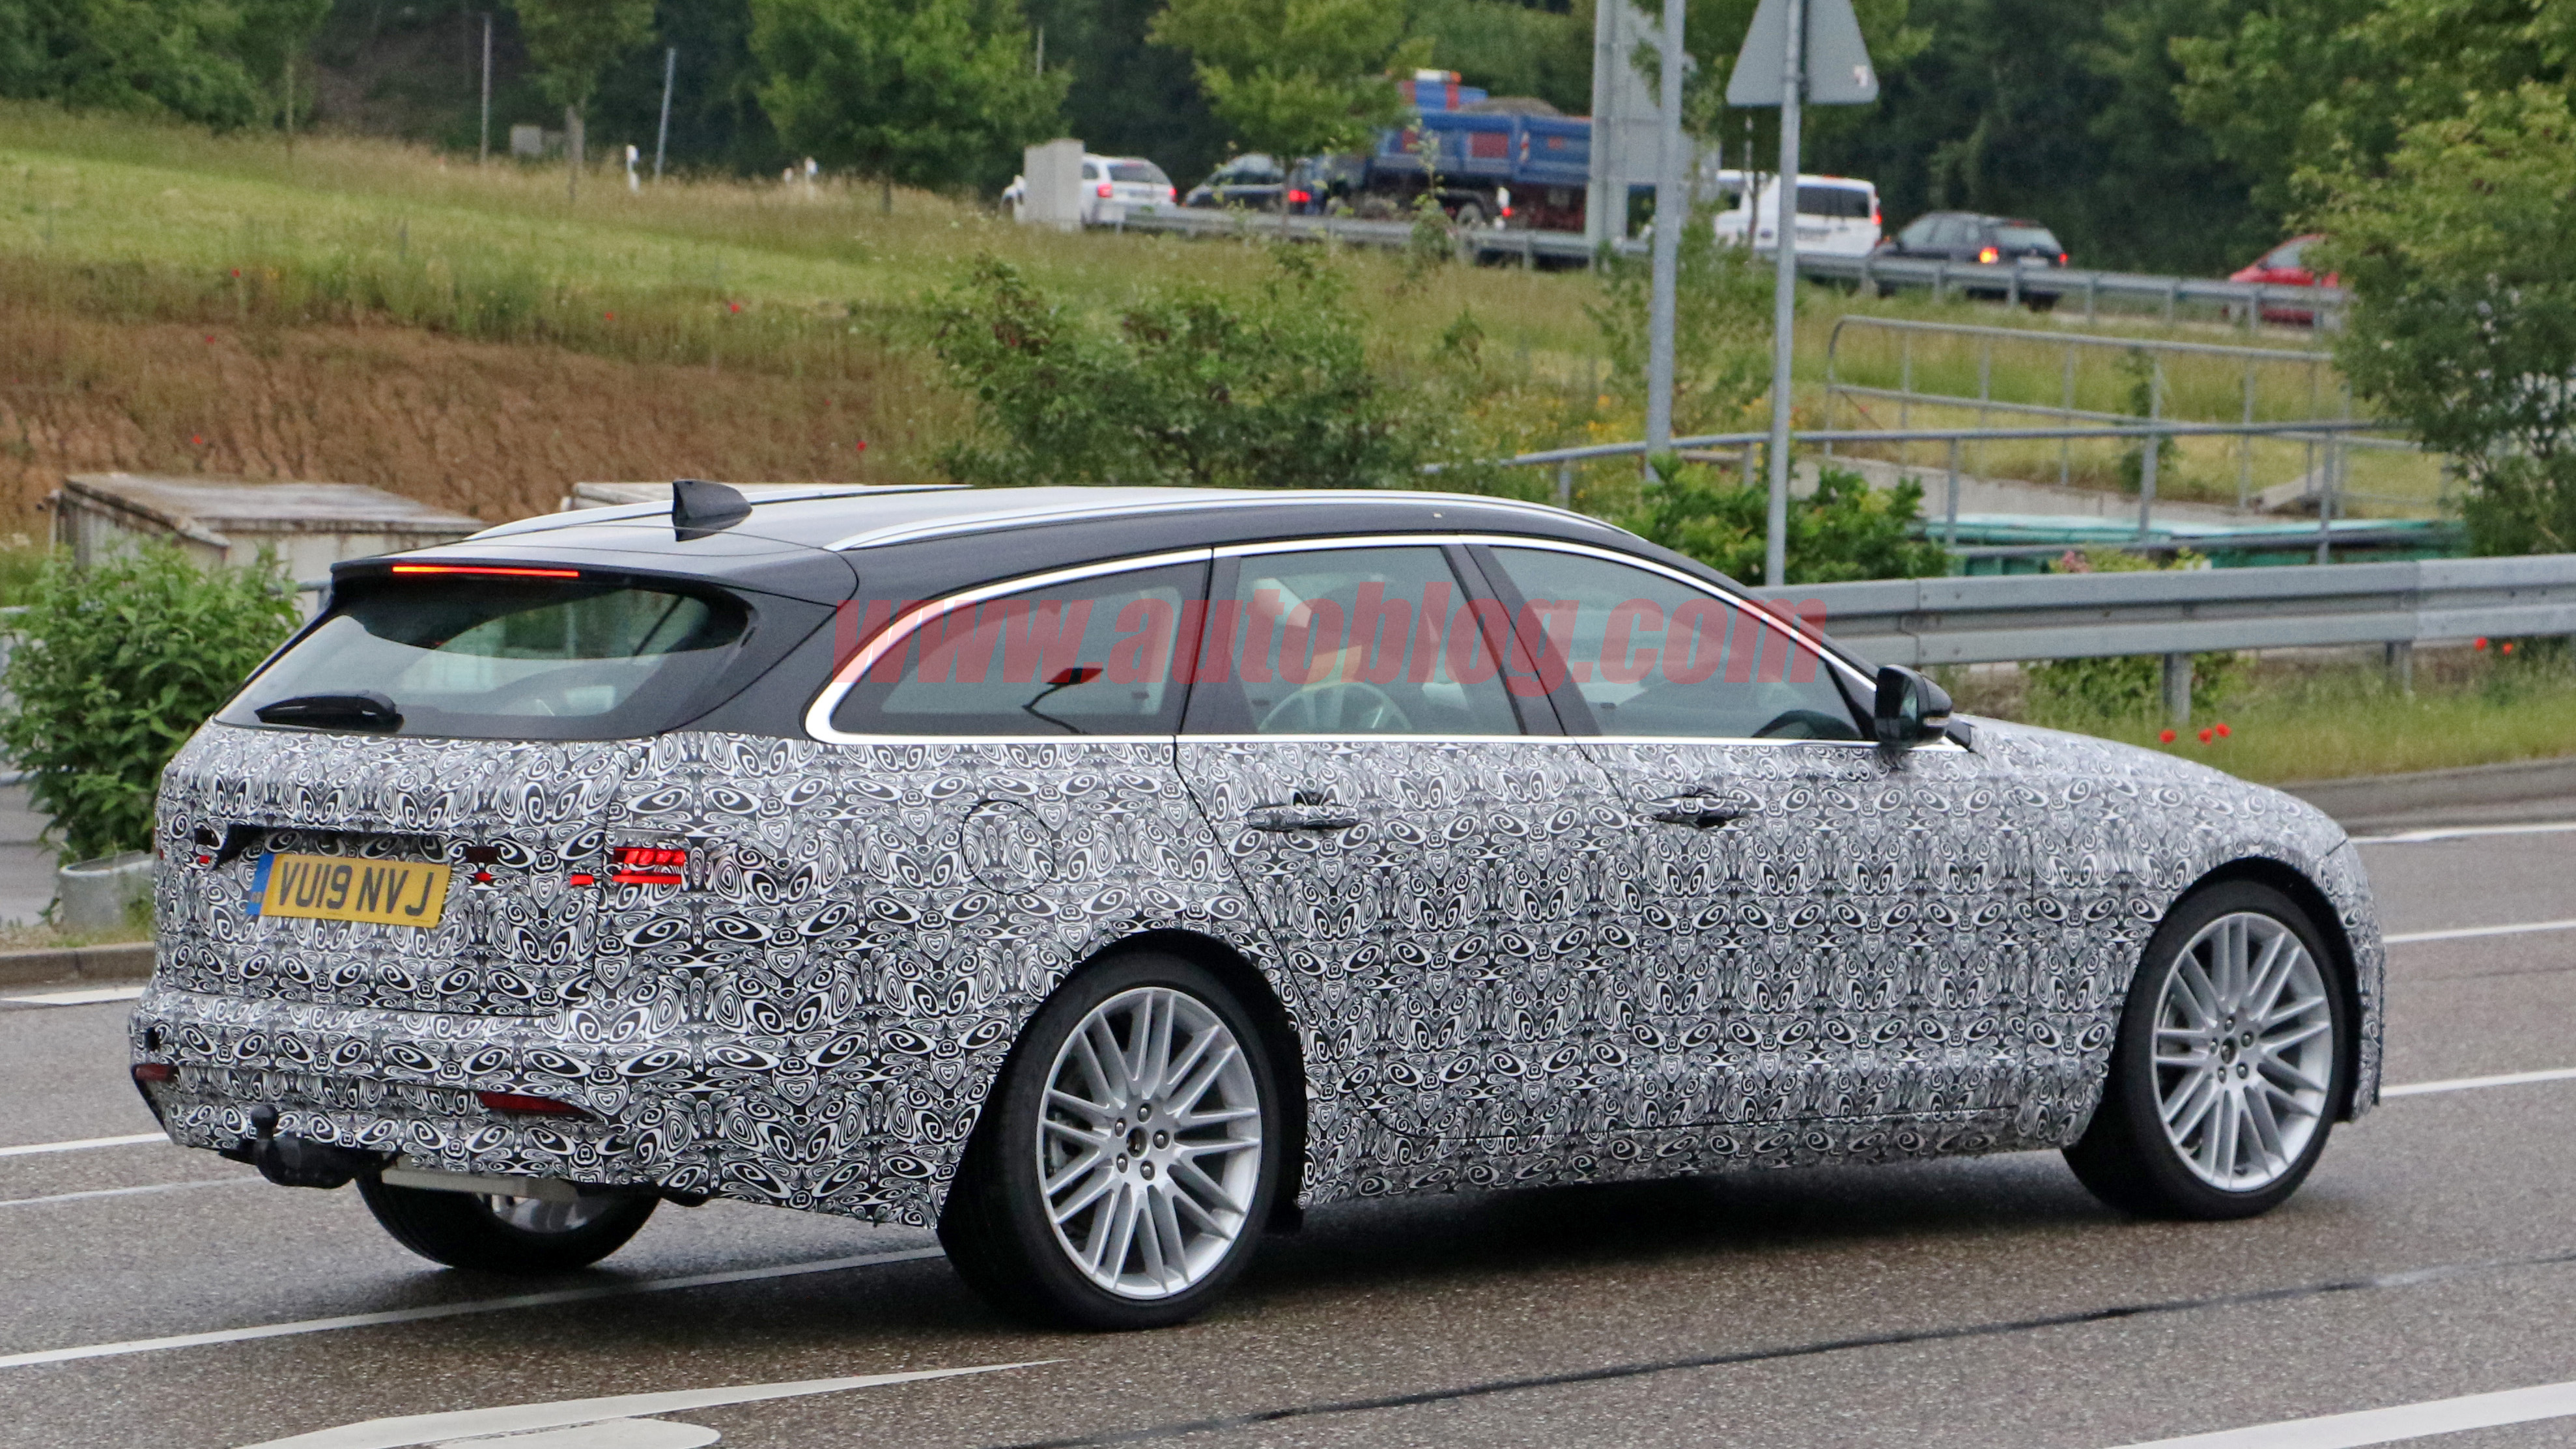 2021 jaguar xf sportbrake and xf sedan spied sporting